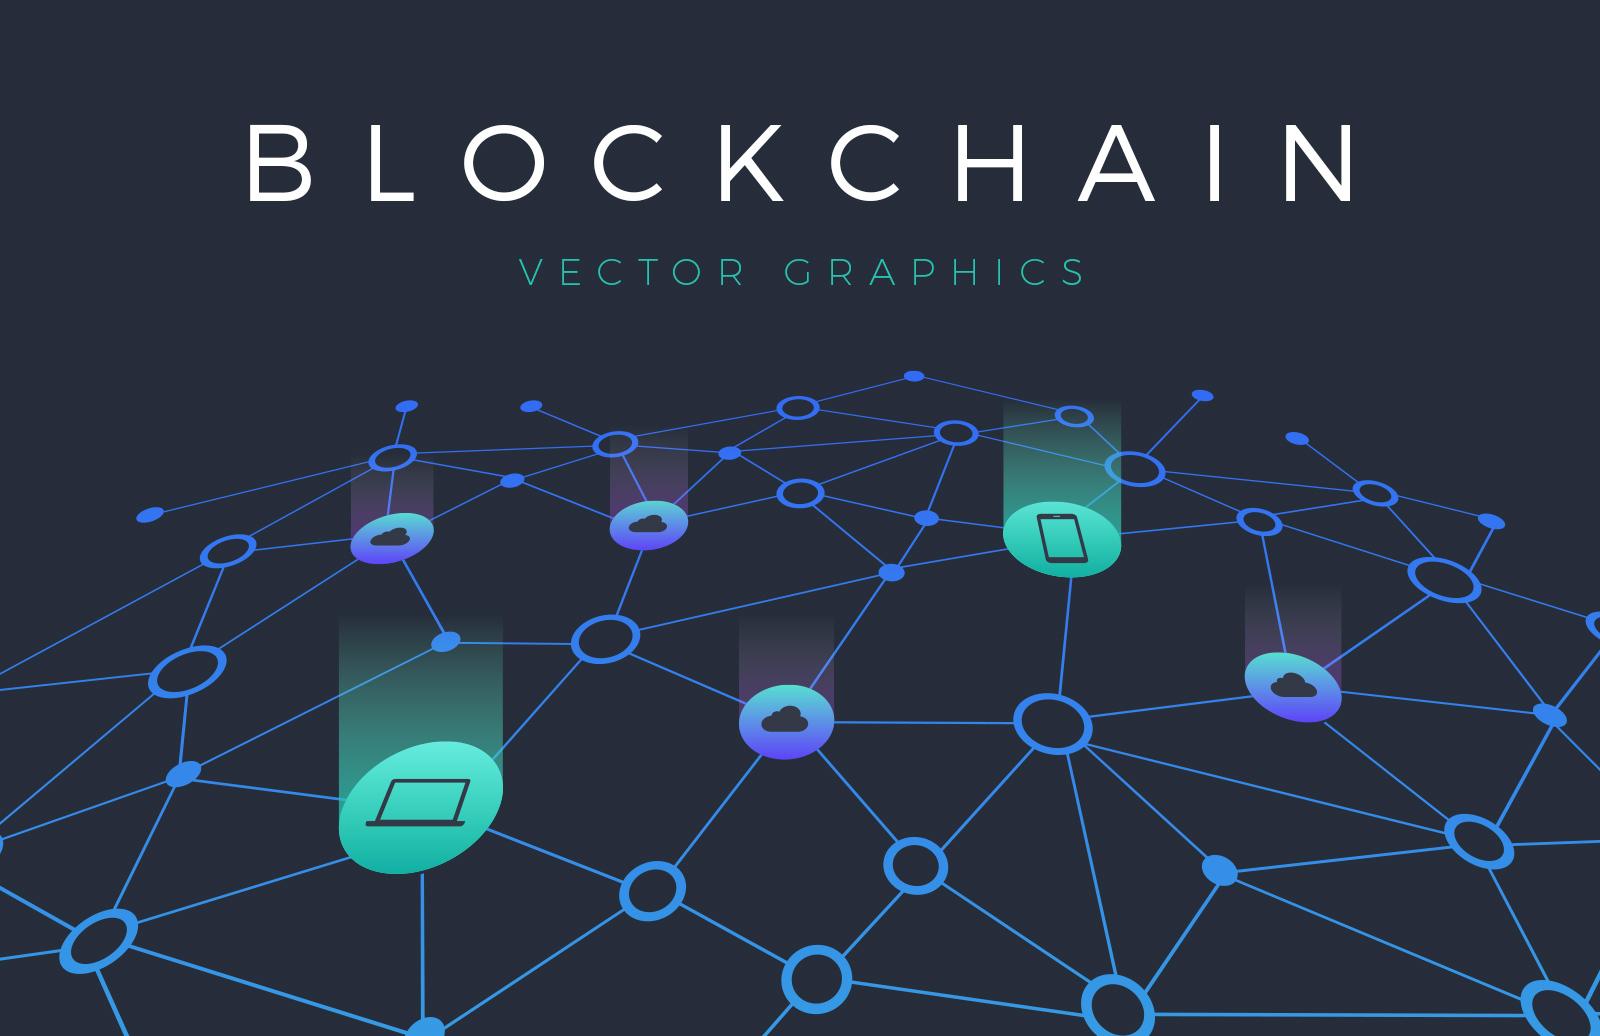 Blockchain Vector Graphics